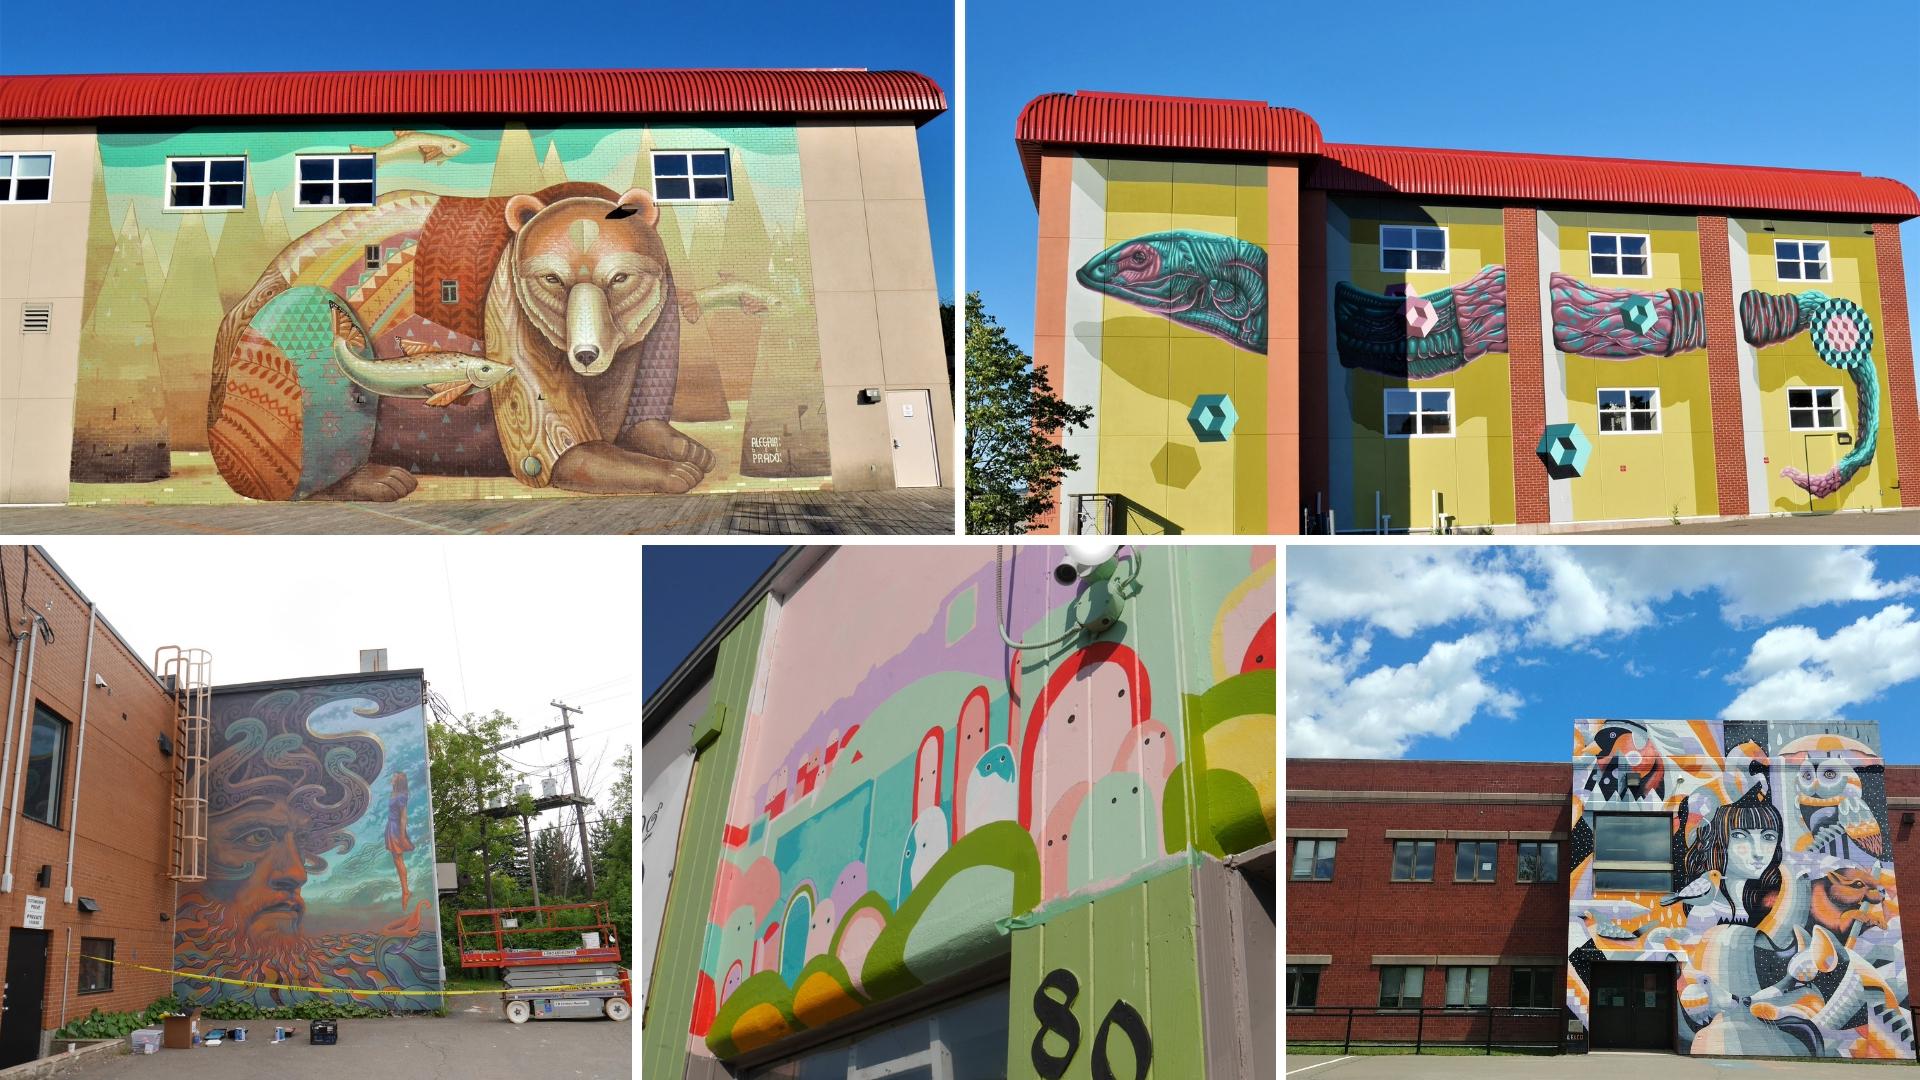 murales festival inspire moncton street art canada